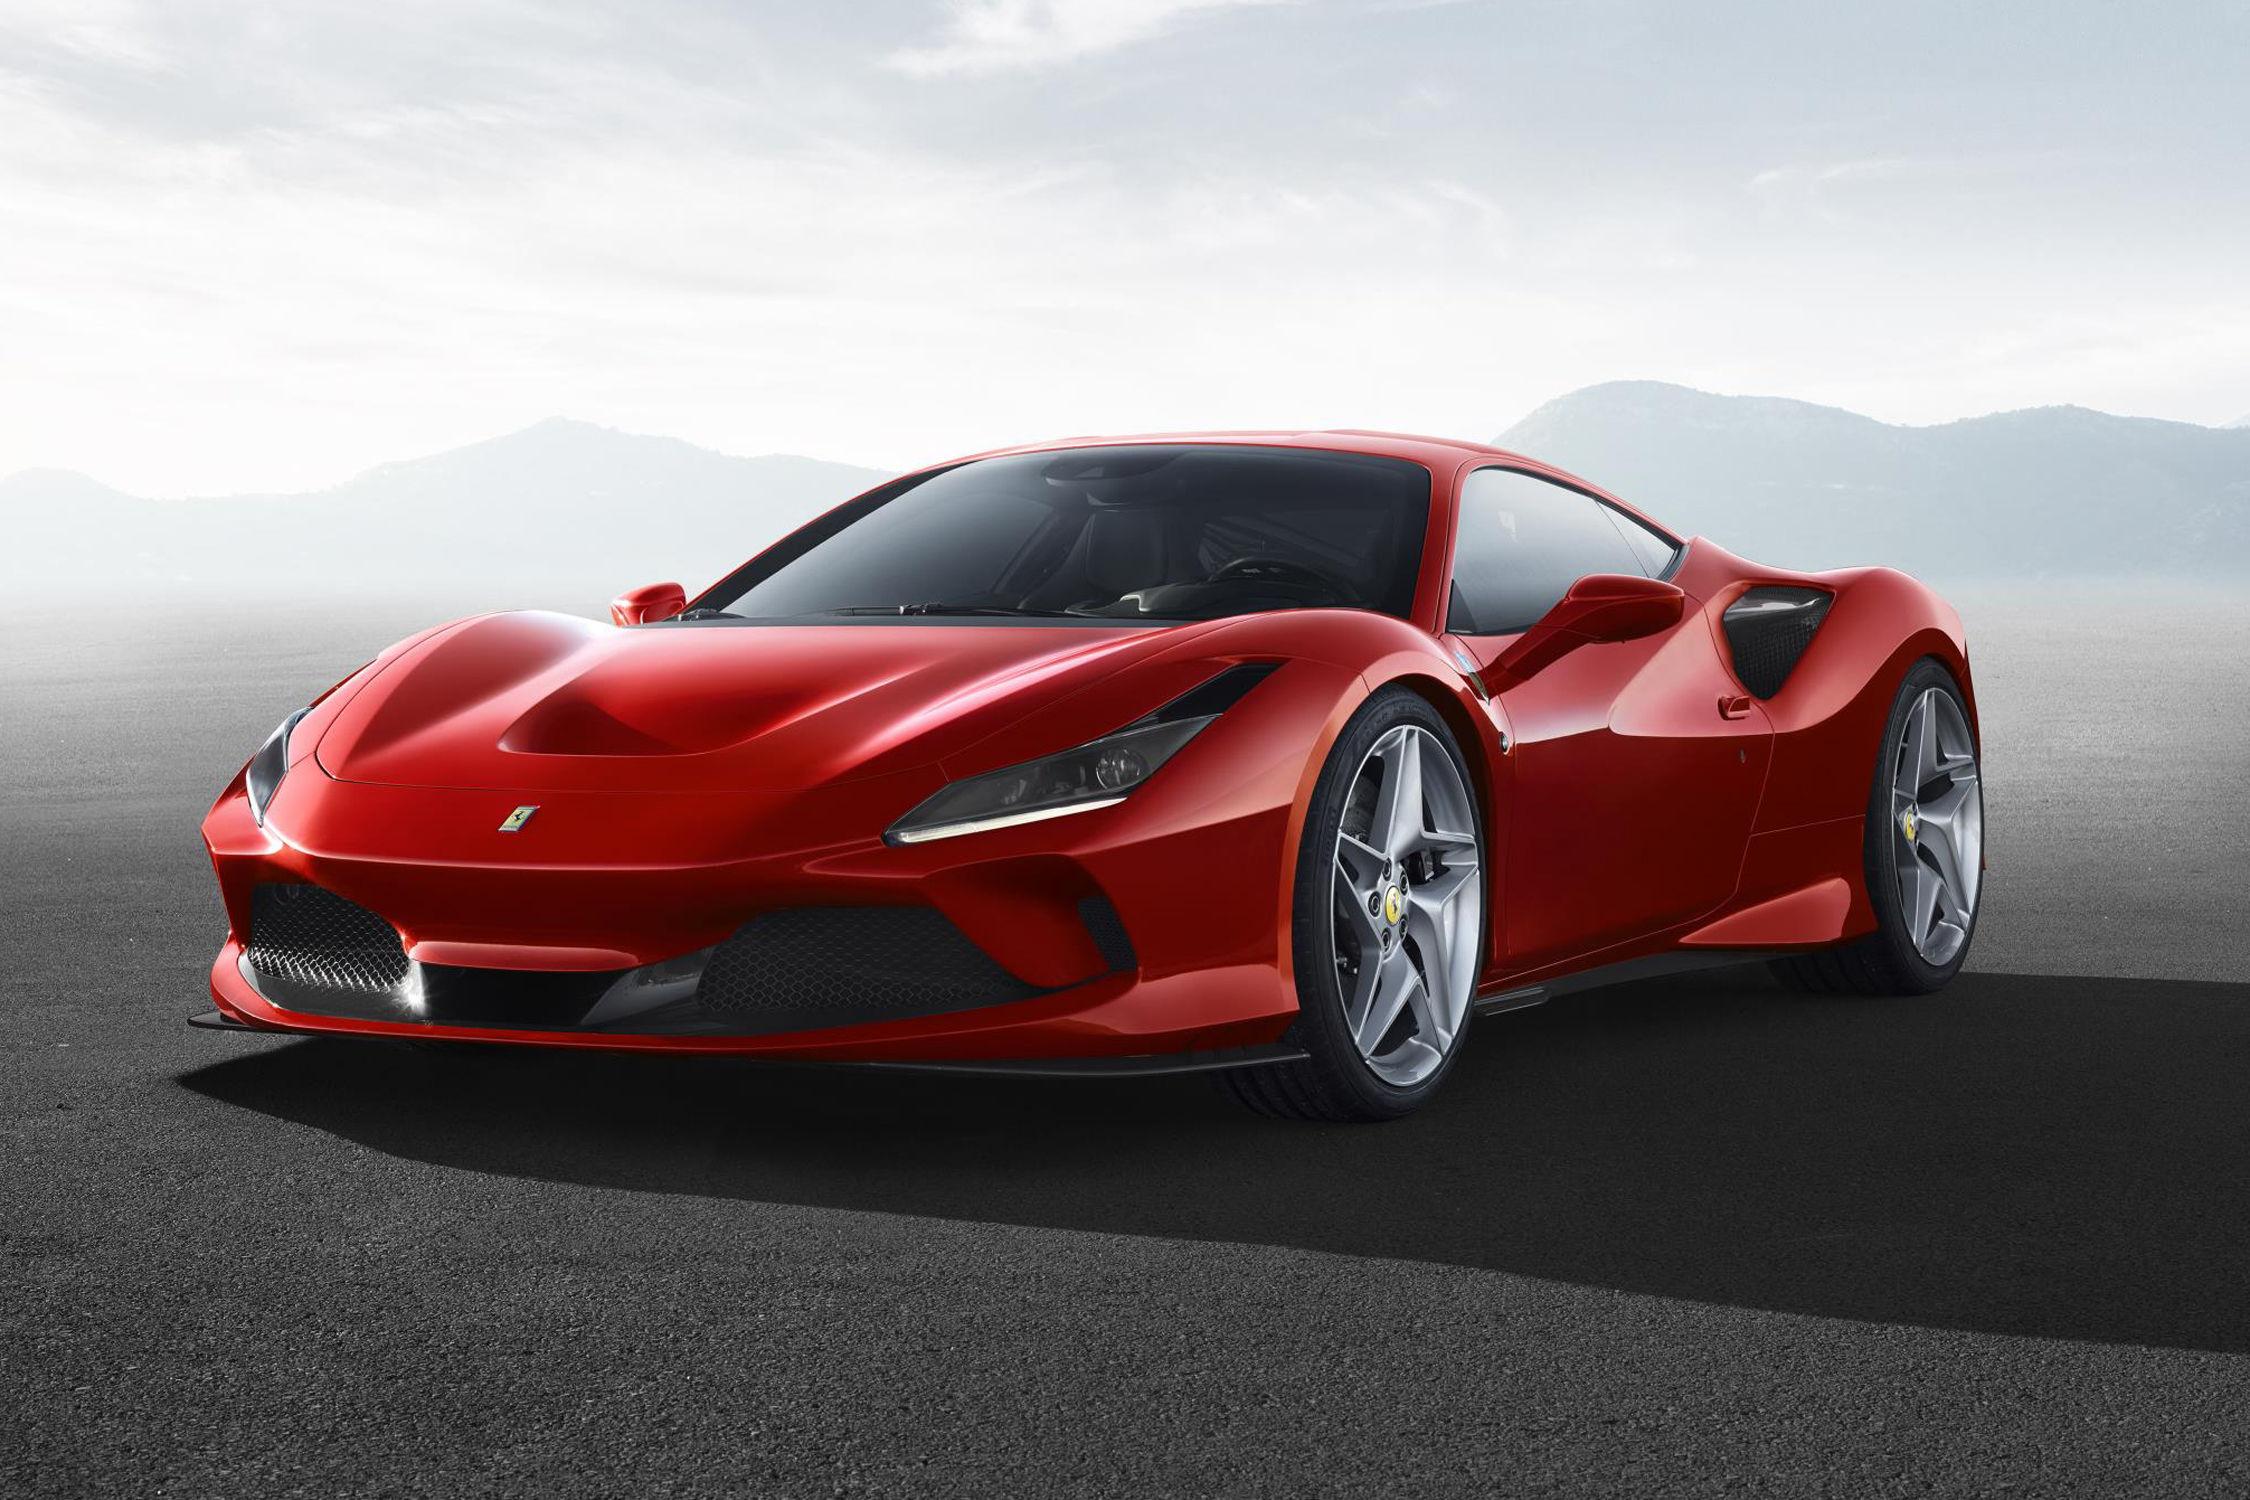 1 000 ch attendus — Nouvelle Hypercar Ferrari